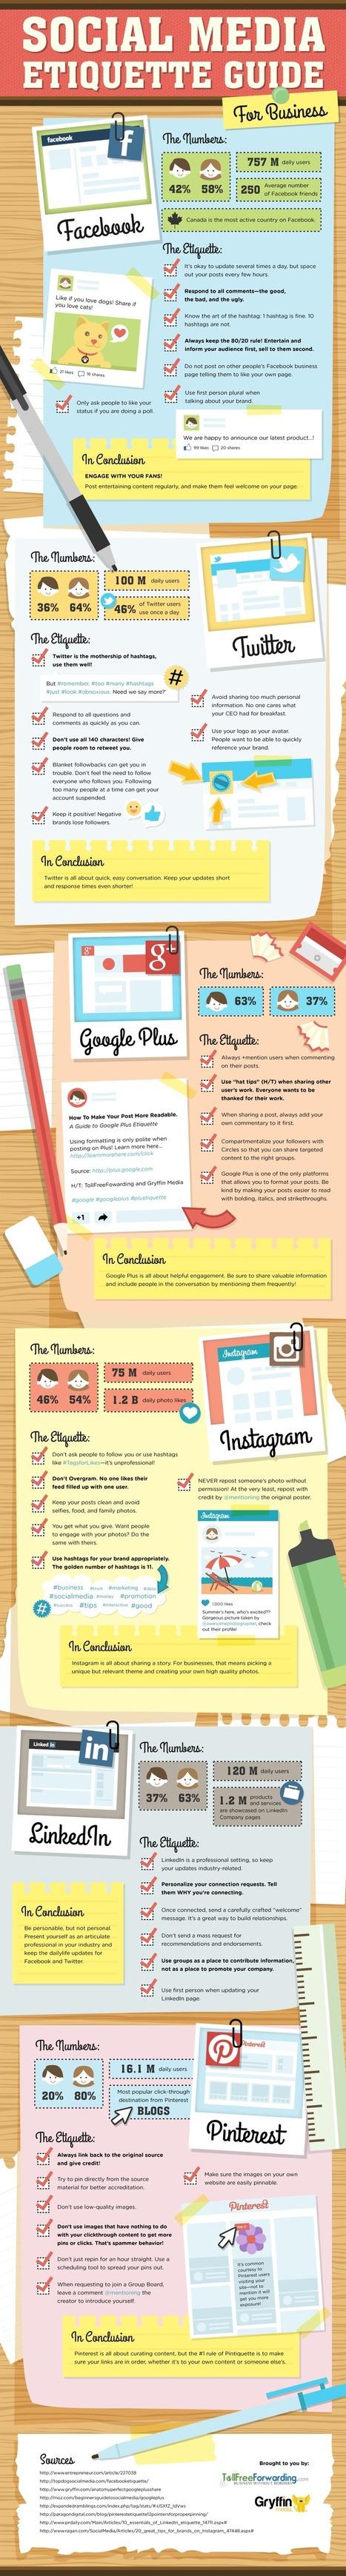 38 Tips on Social Media Etiquette for Business | World of #SEO, #SMM, #ContentMarketing, #DigitalMarketing | Scoop.it